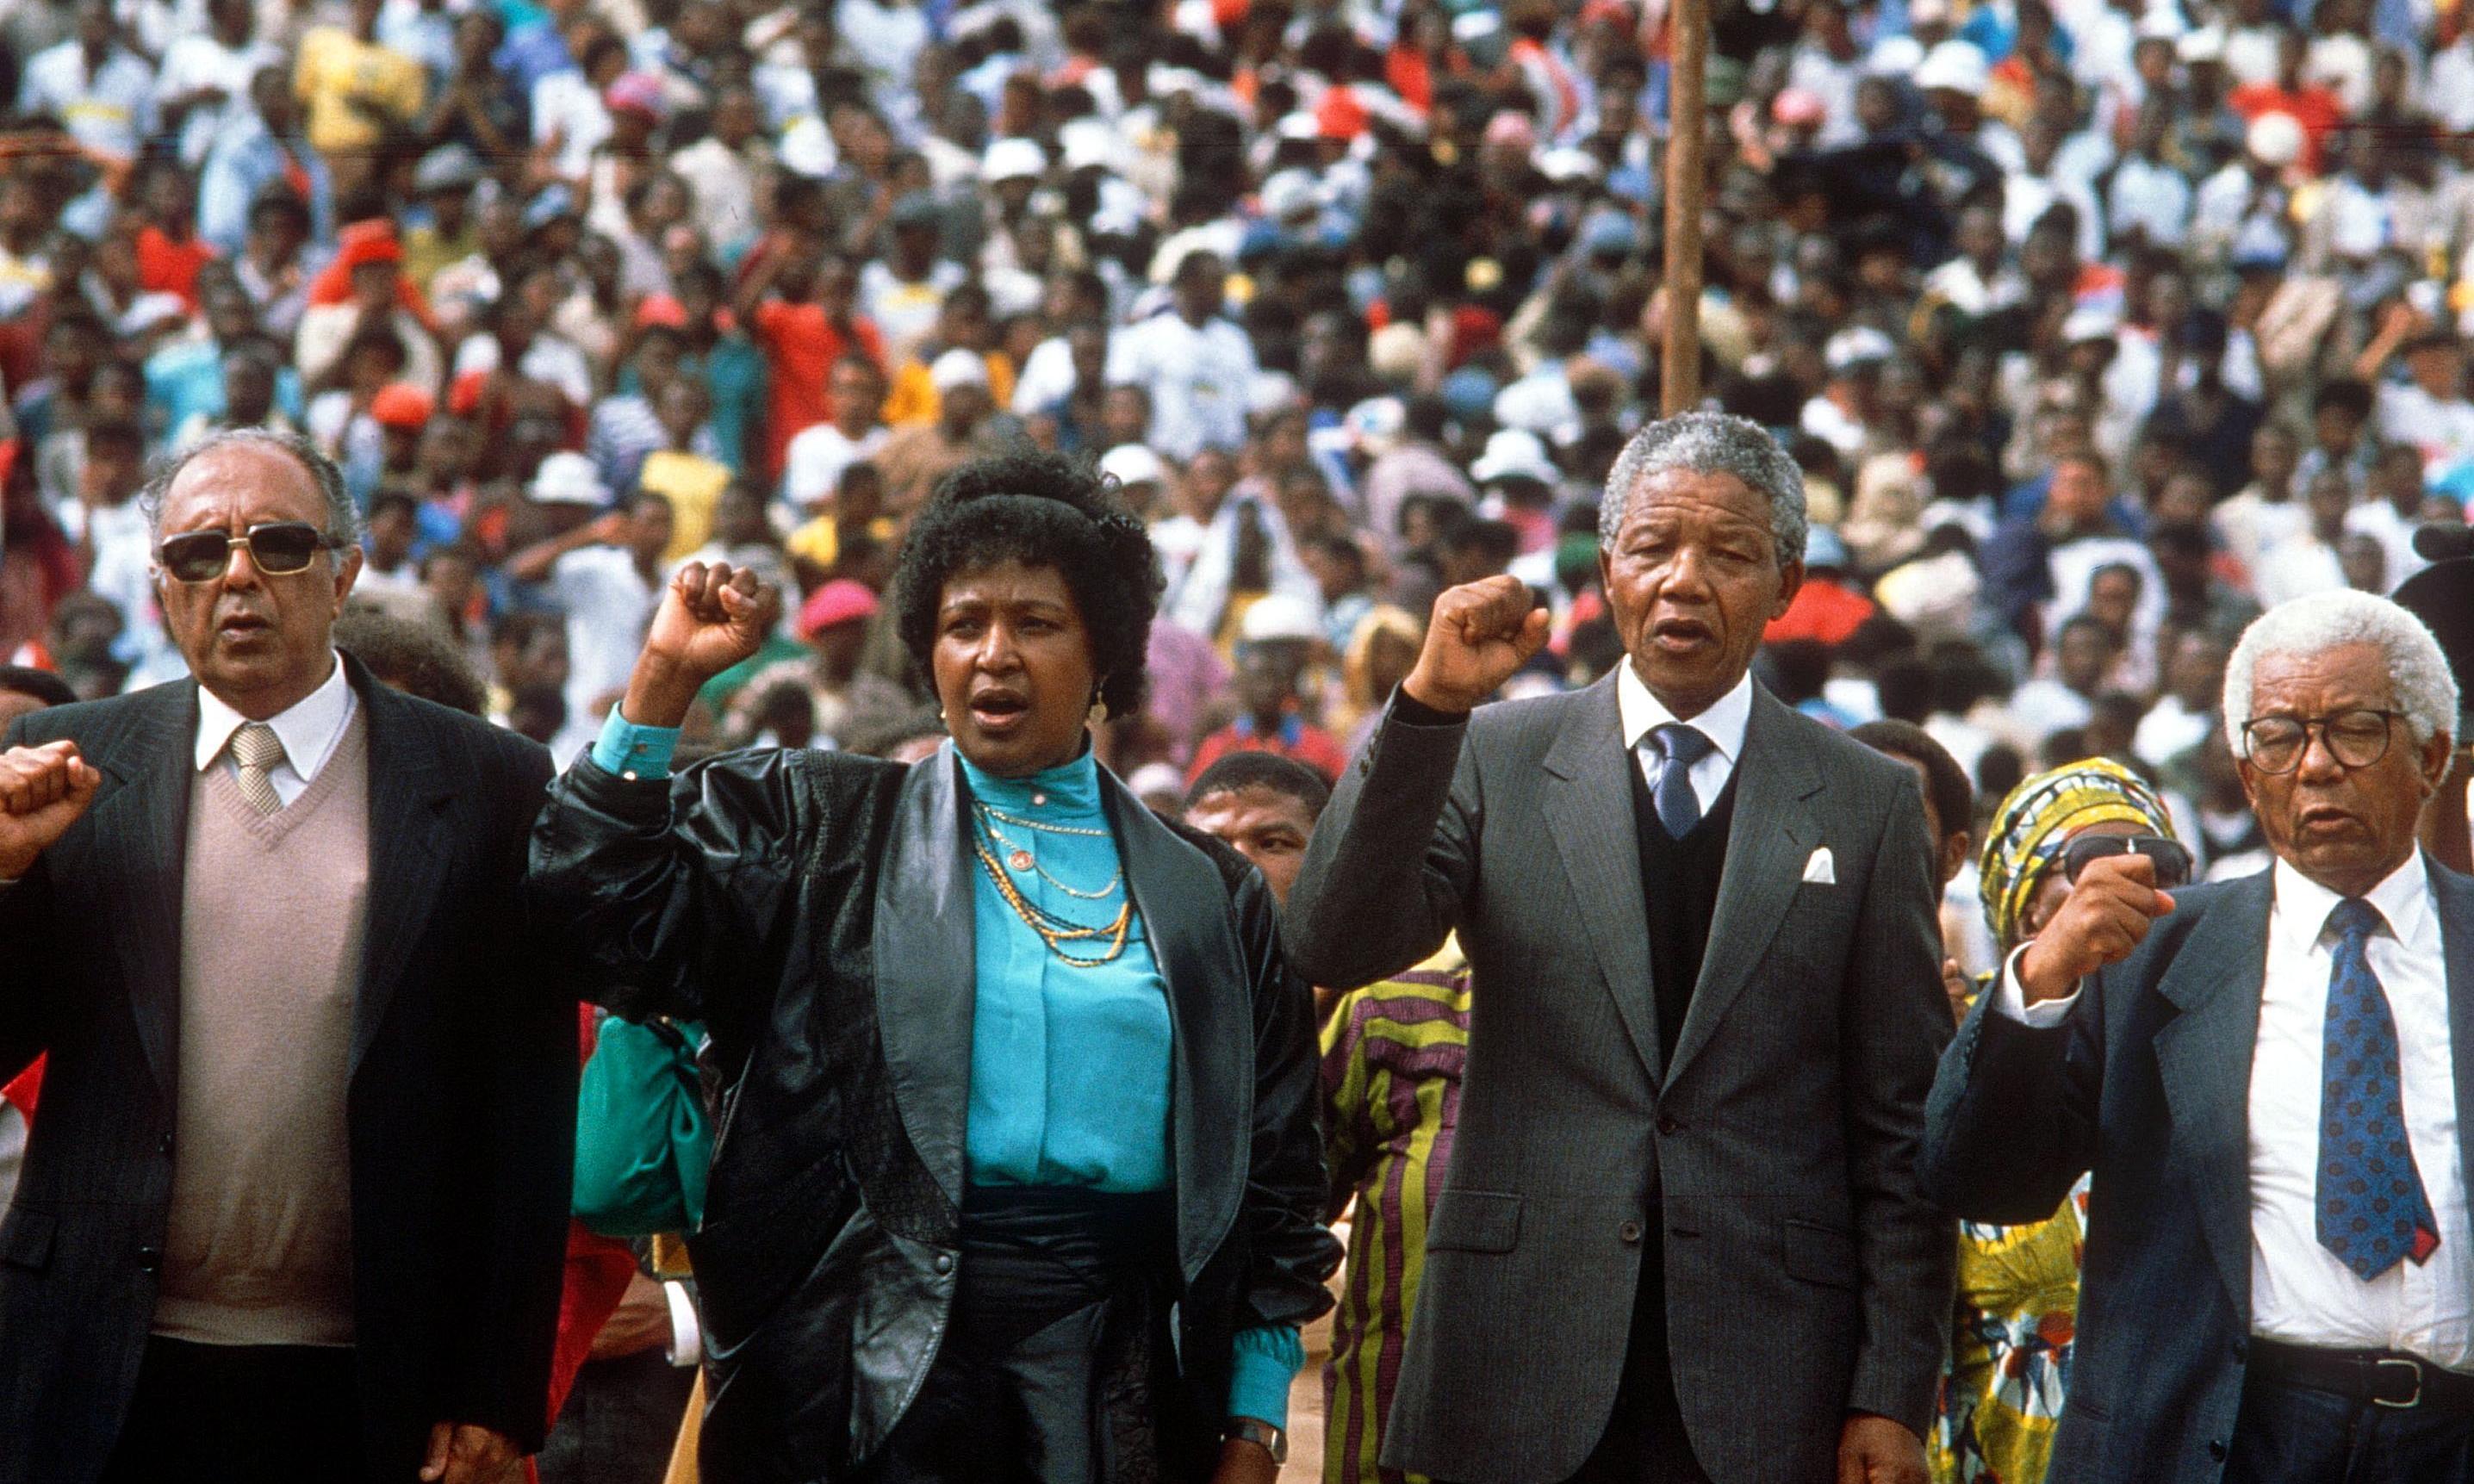 Nelson Mandela's fellow ANC activist breaks silence to demand Jacob Zuma's resignation